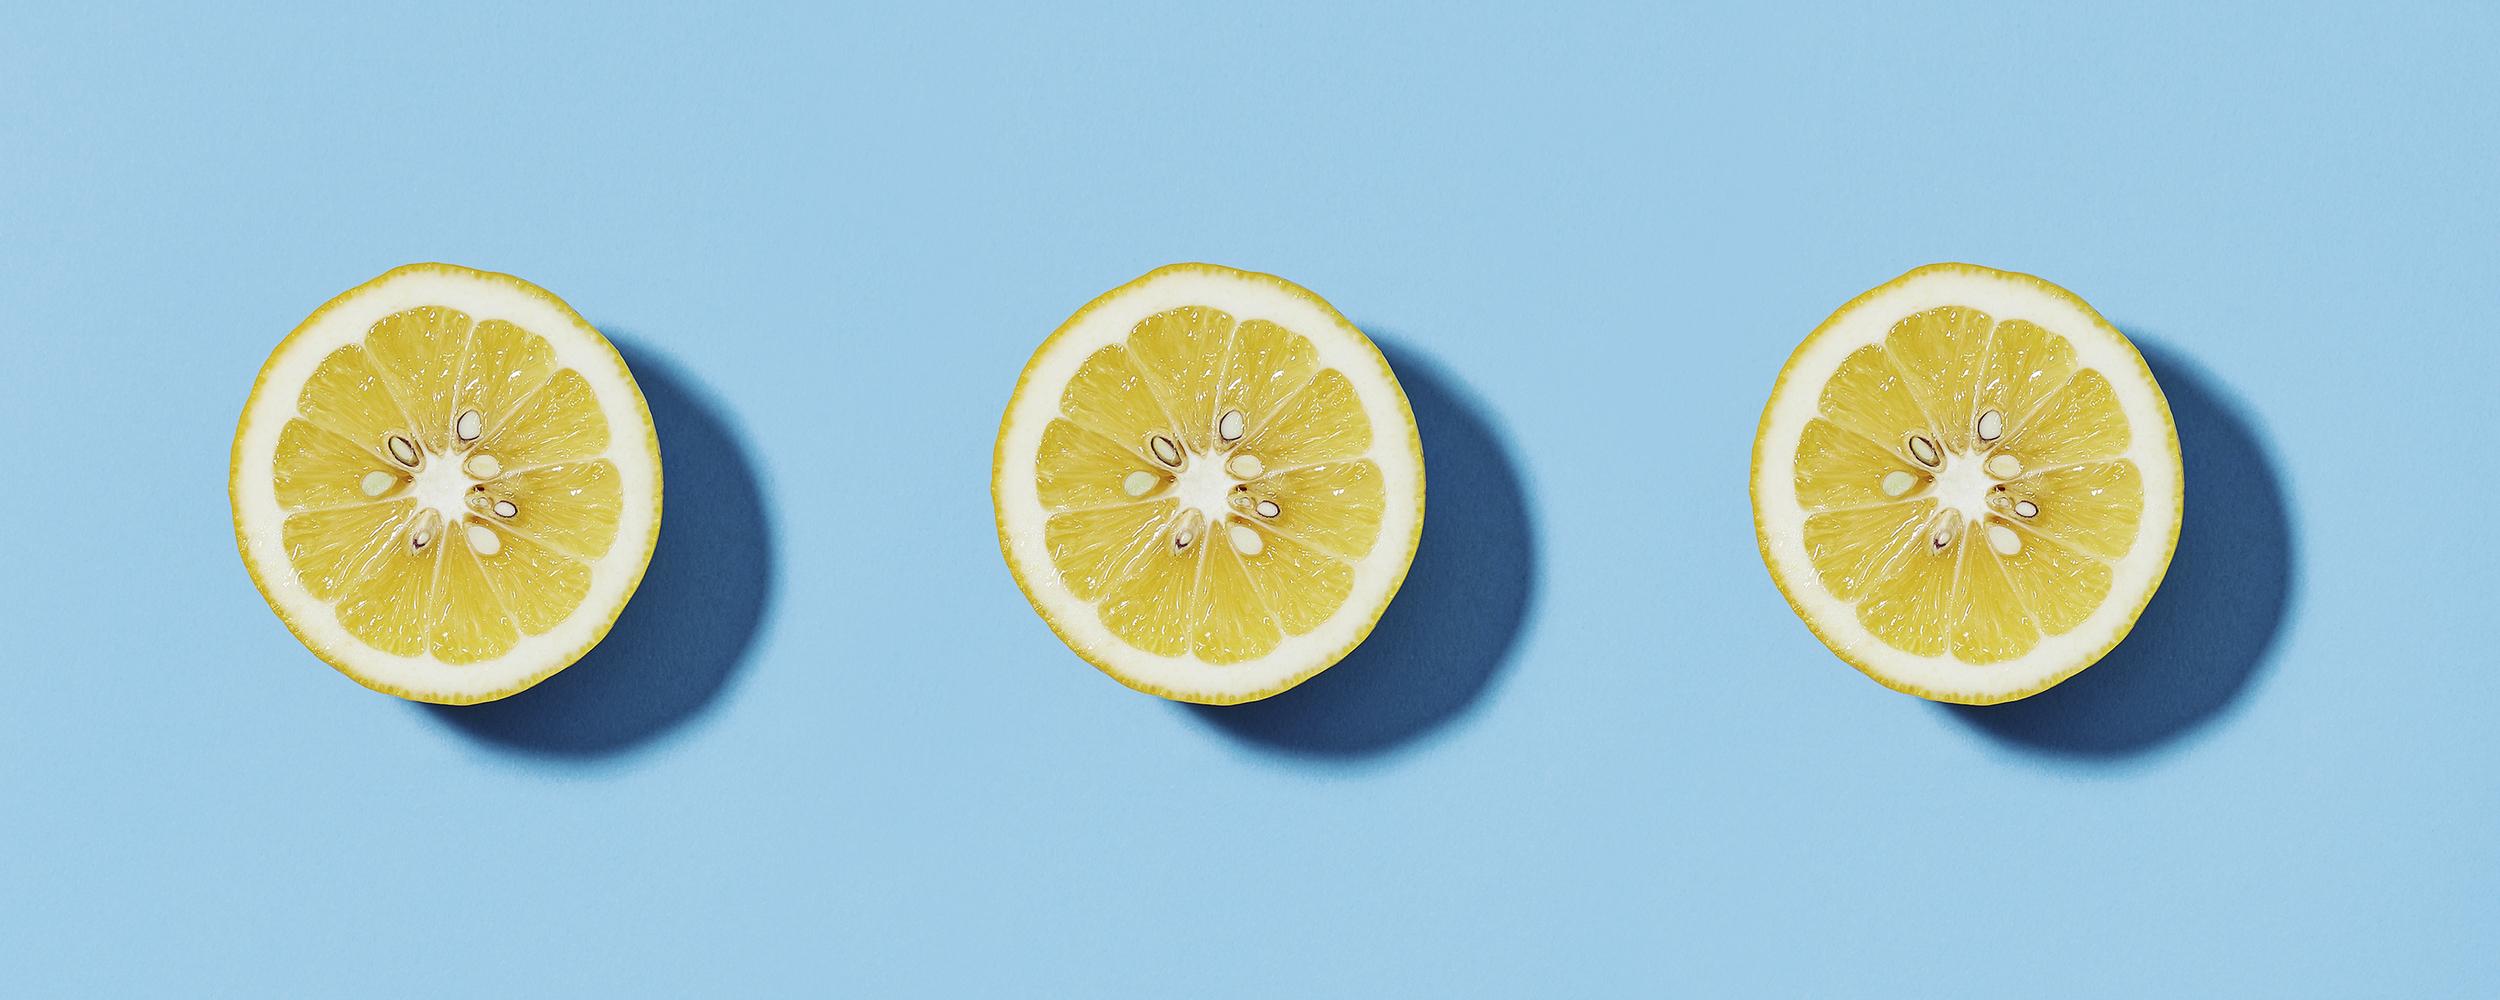 Three lemons on a blue background